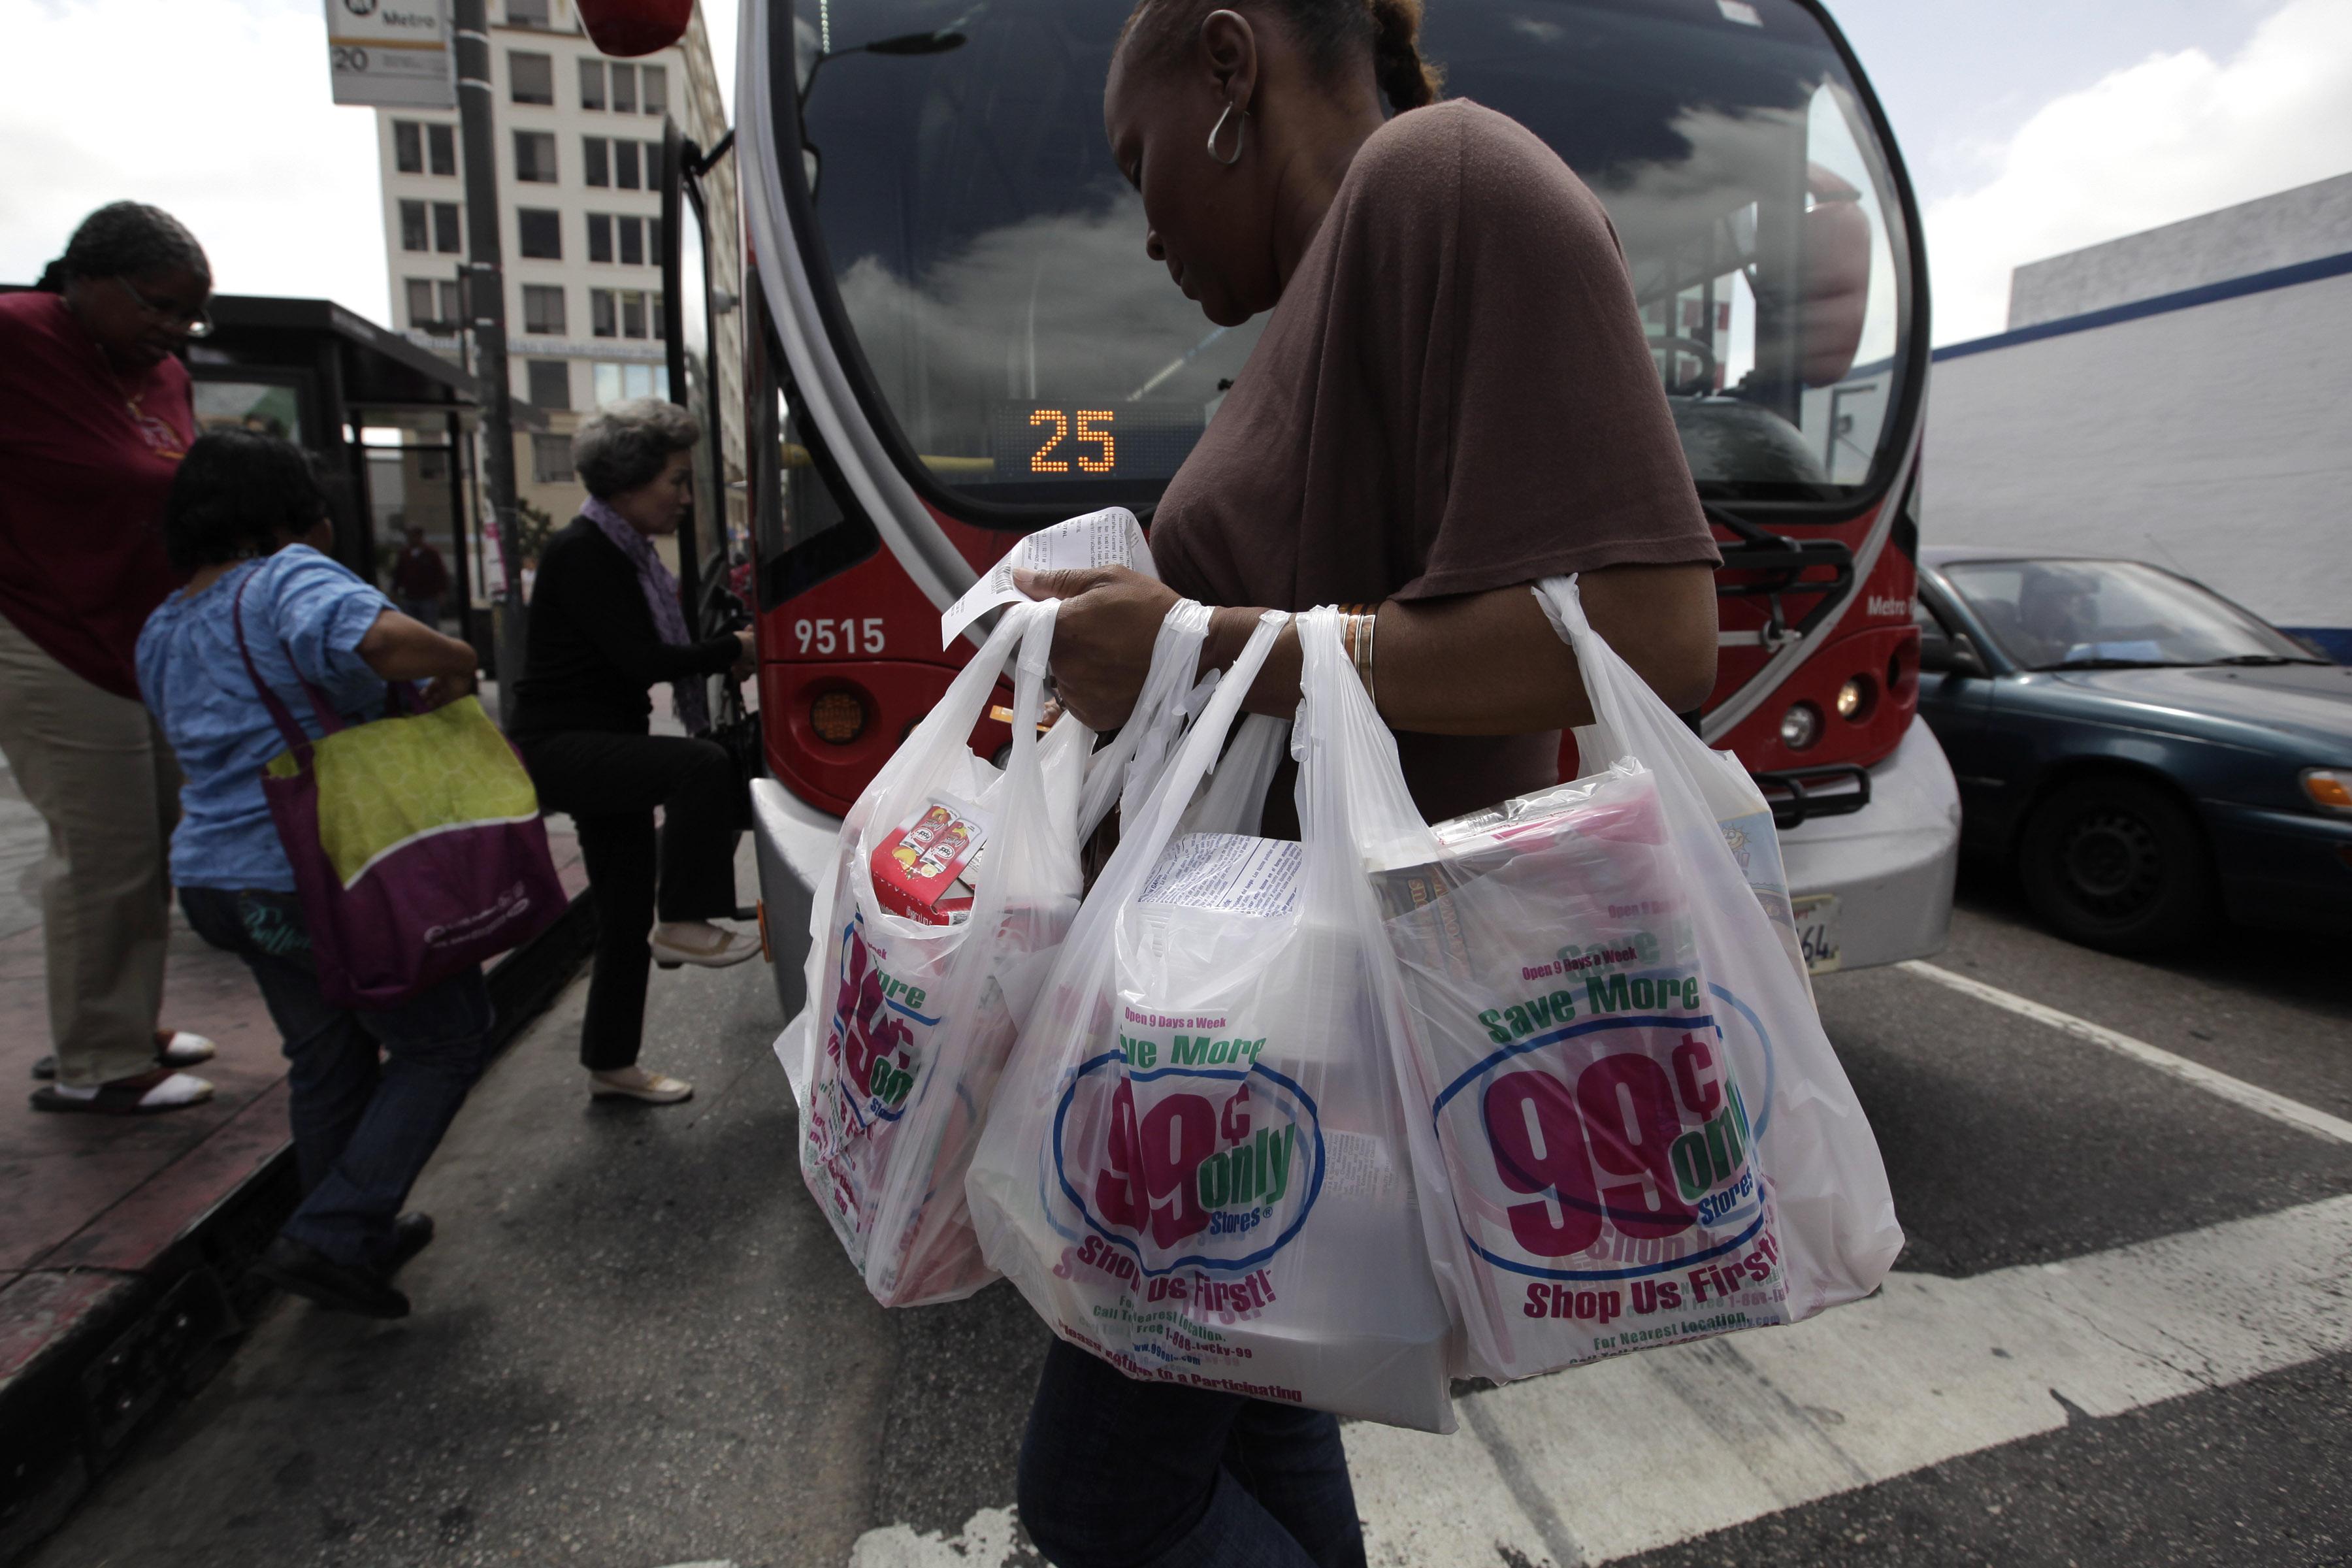 Wolf to veto plastic bag bill despite bipartisan support ... 804cda094a203